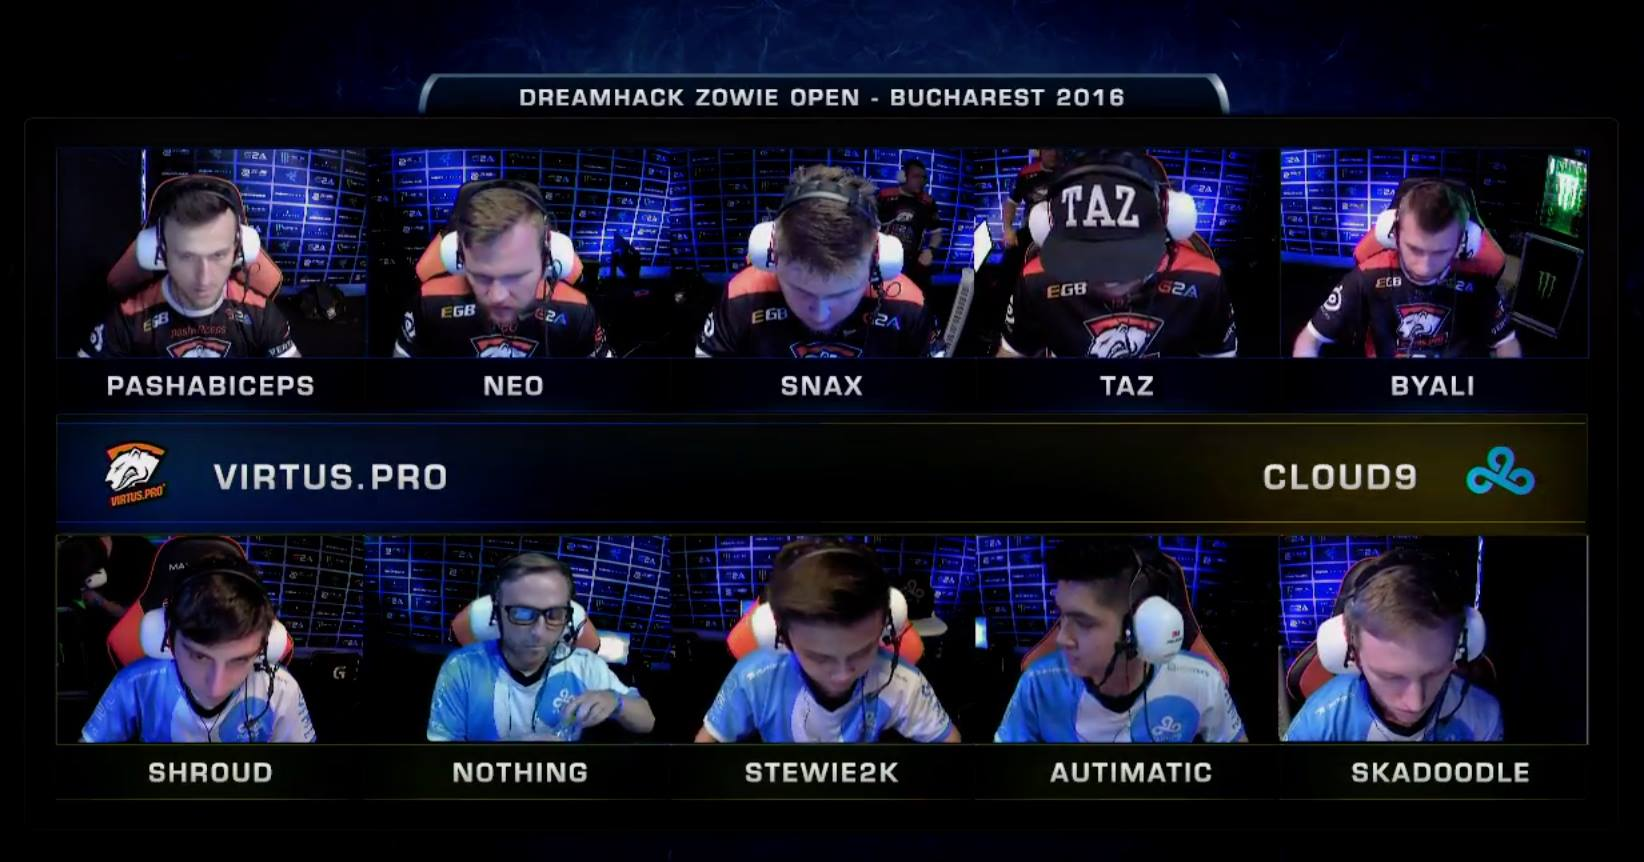 dreamhack-zowie-open-2016-news-my-geek-actu-team